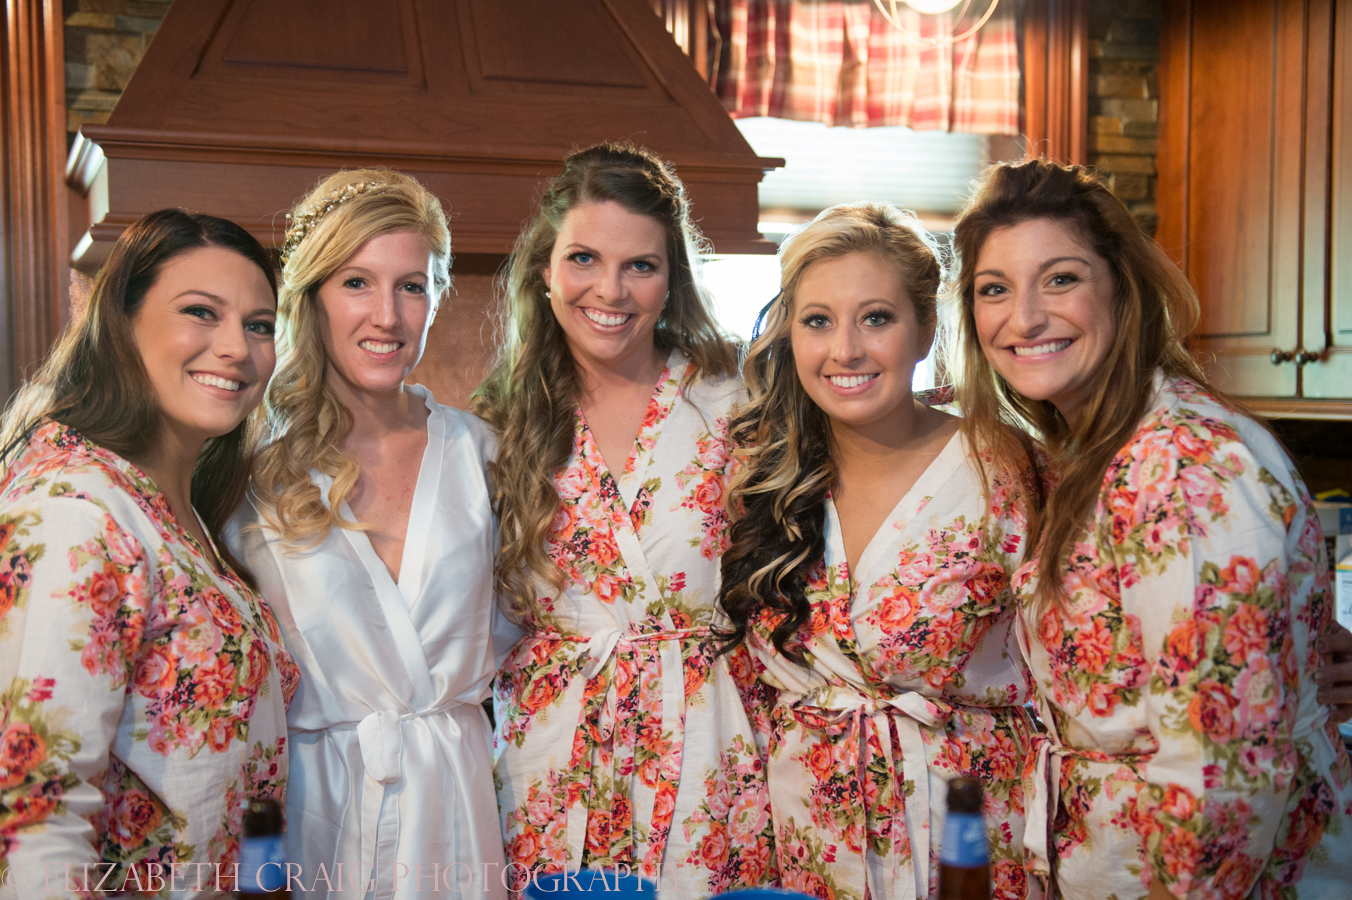 Dubois Brockway St. Marys PA Weddings-0019